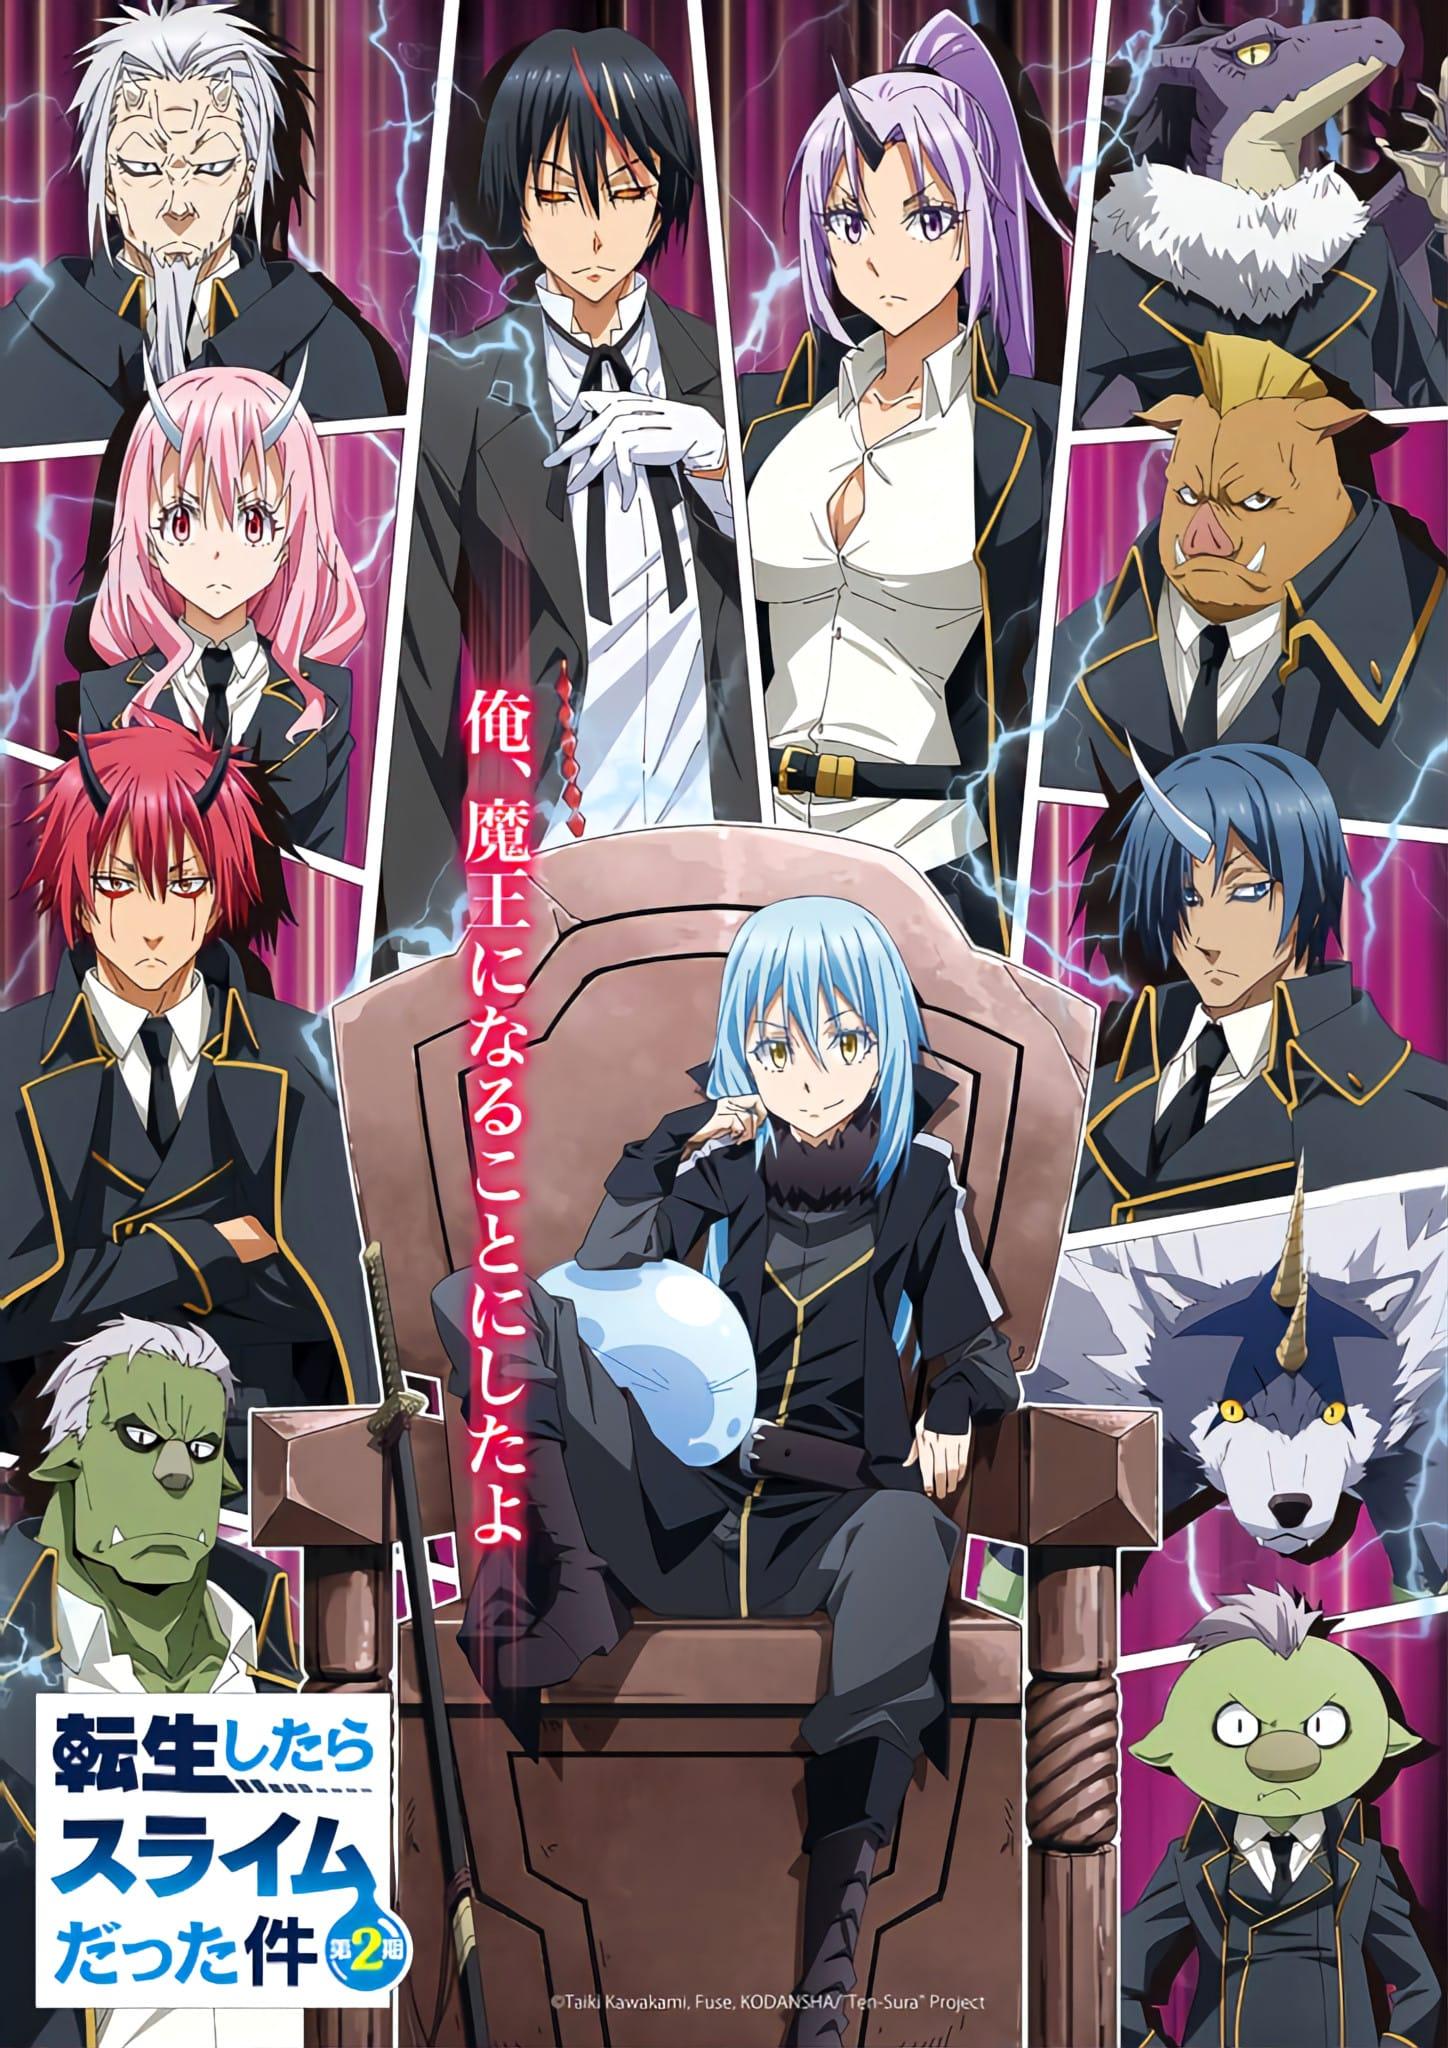 Tensei shitara Slime Datta Ken Season 2 Batch Subtitle Indonesia [x265]